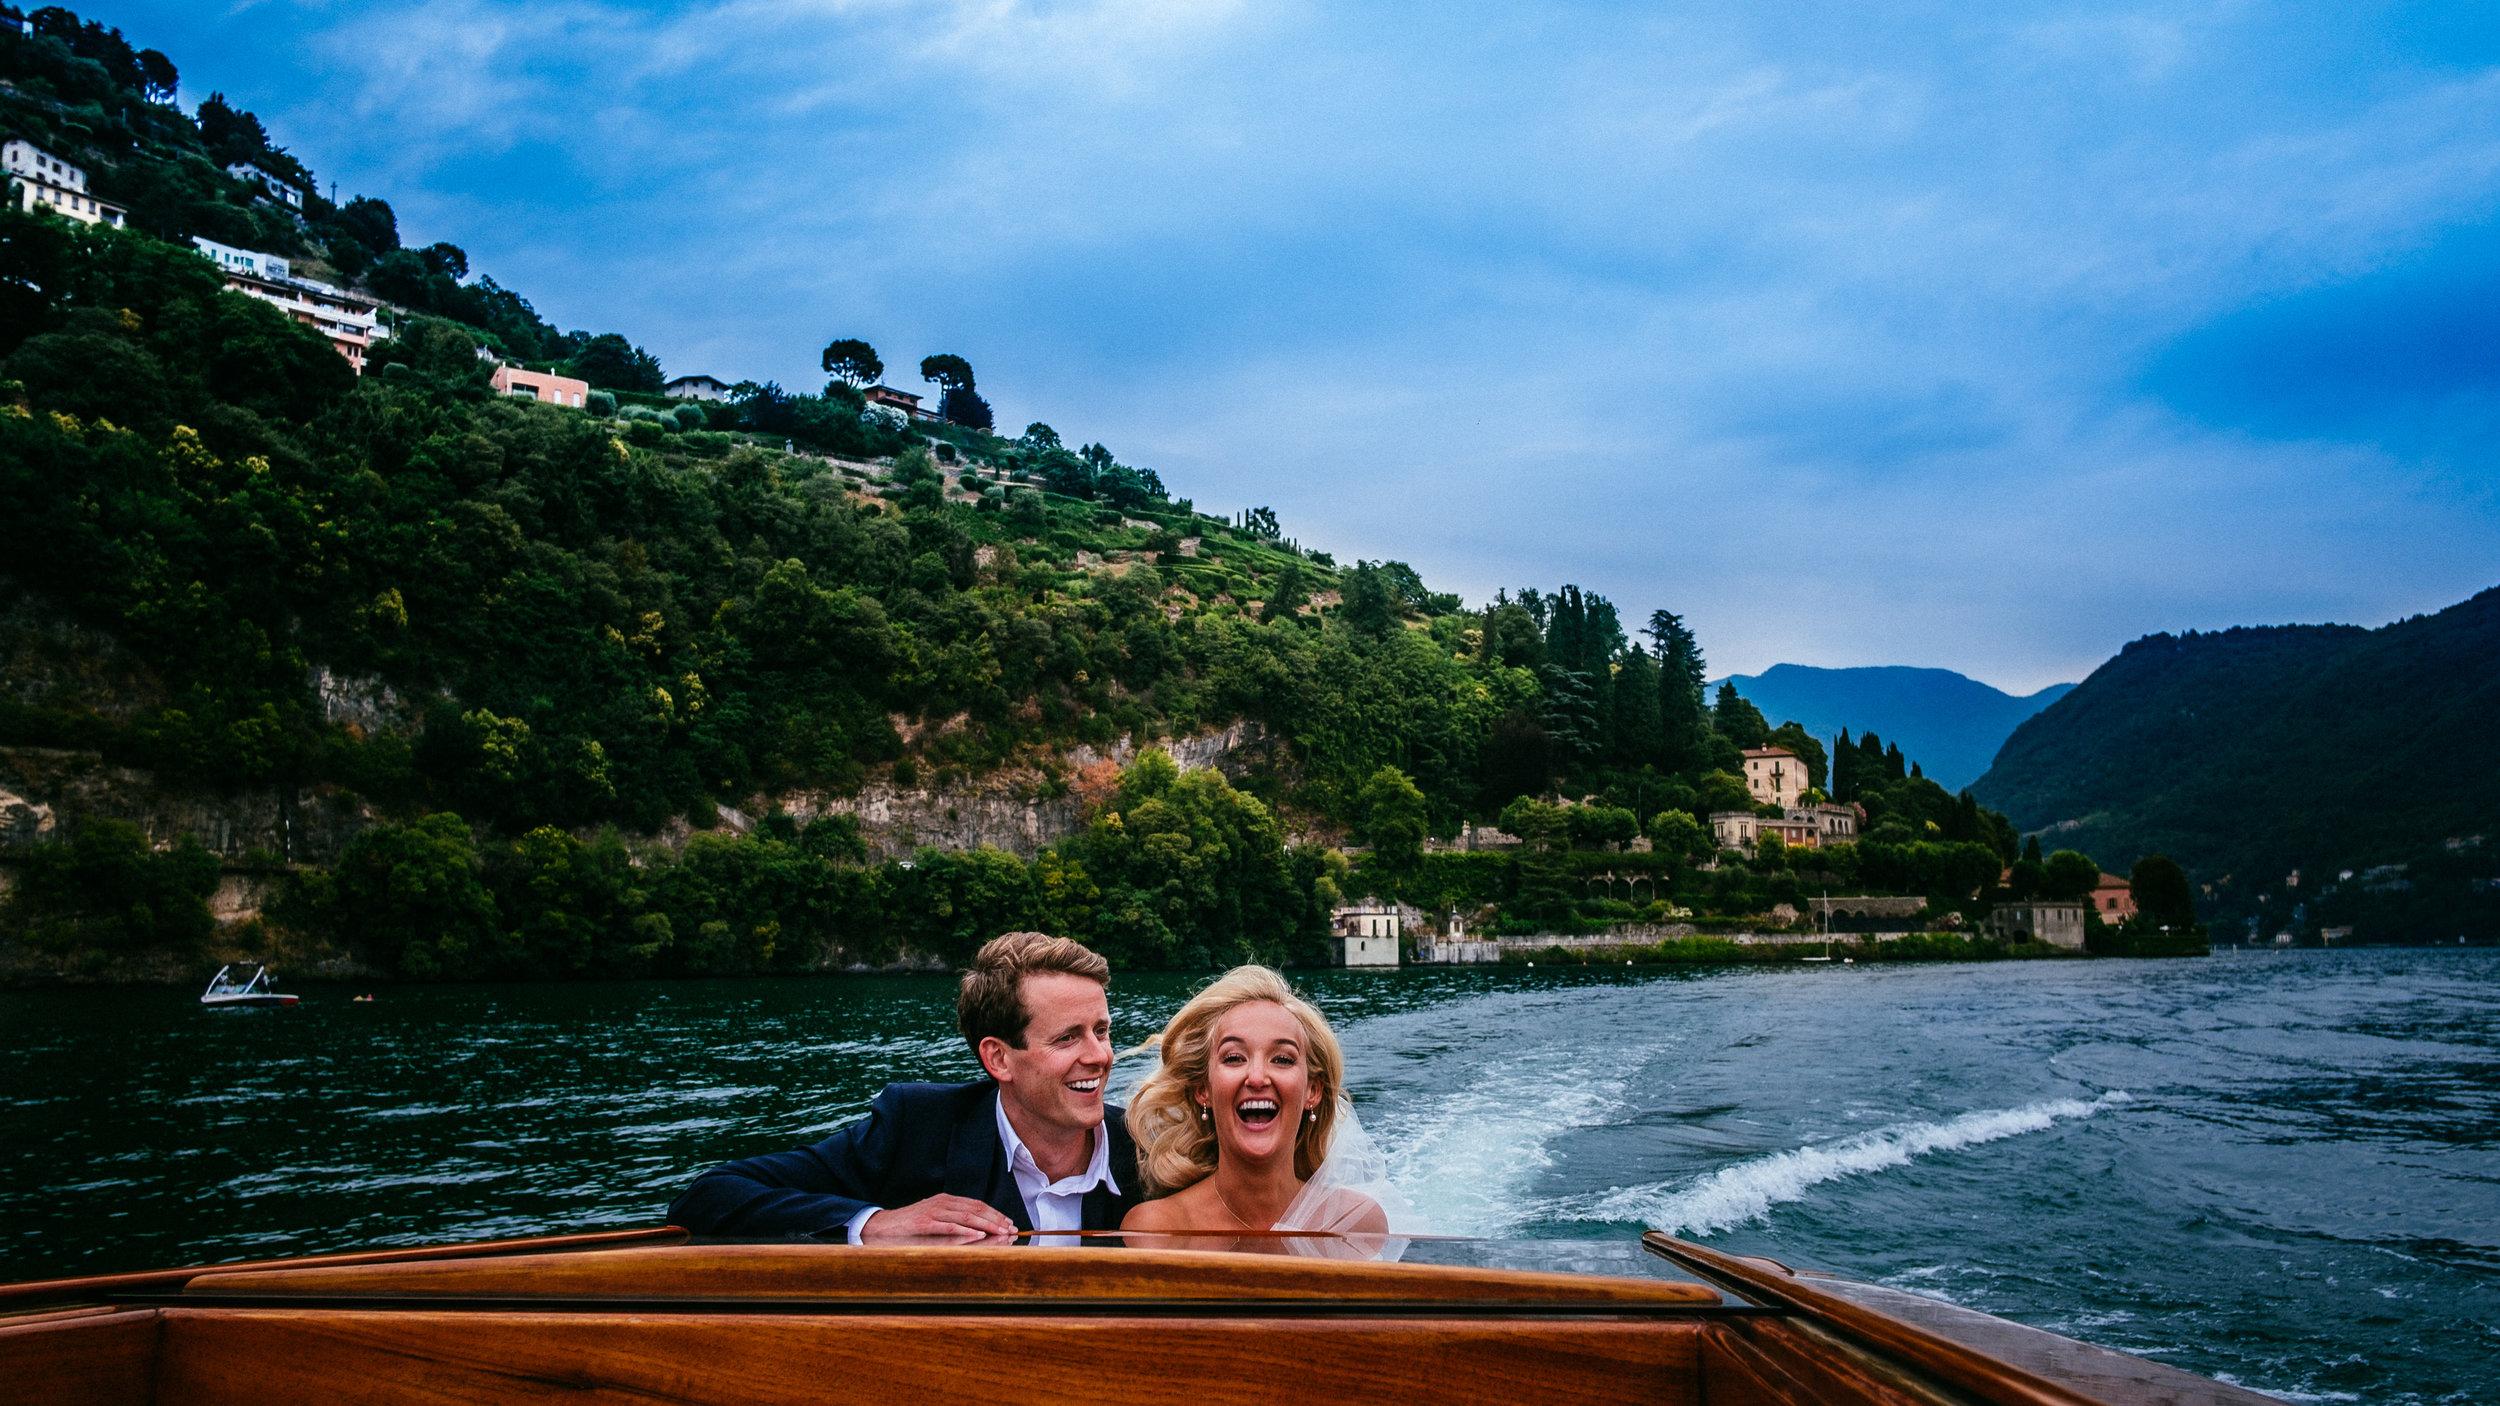 wedding photographer training manchester